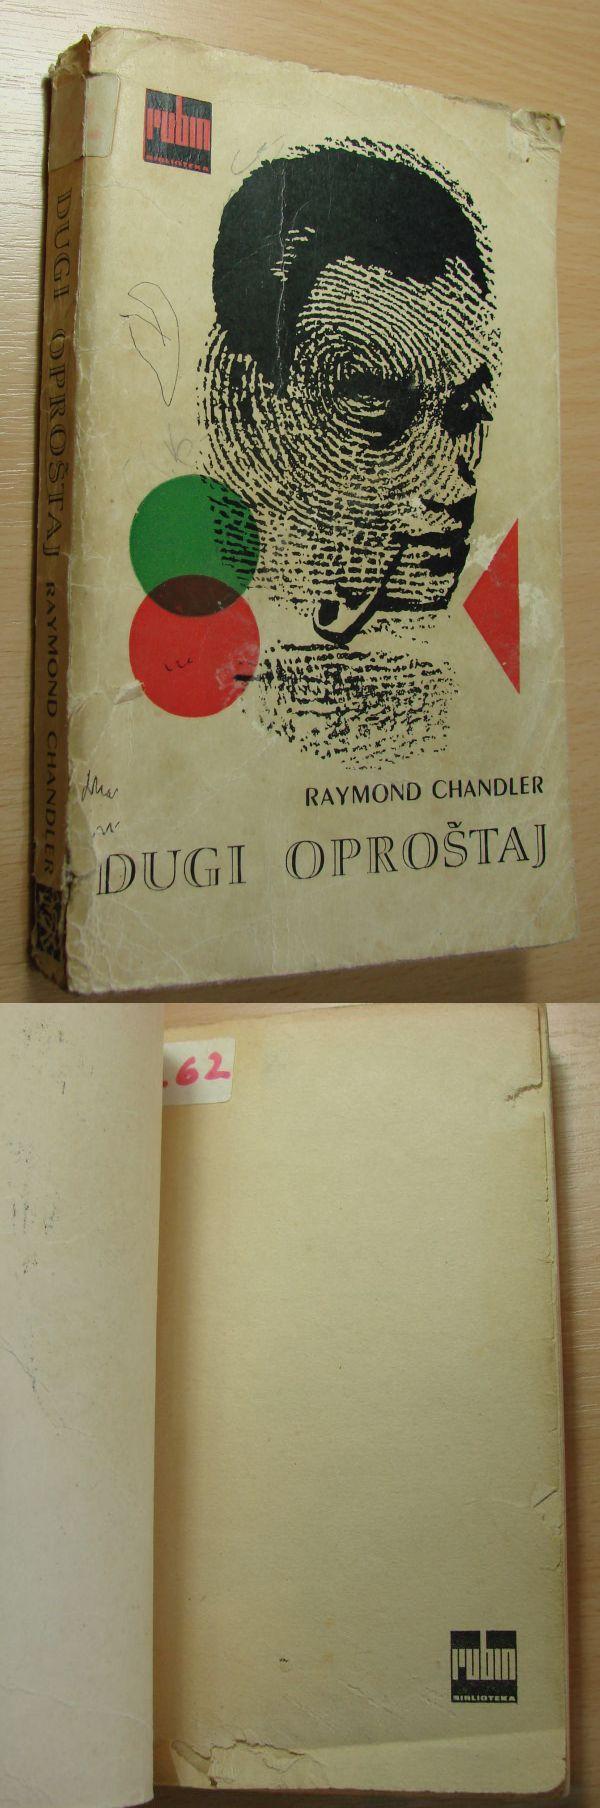 Raymond Chandler: Dugi oproštaj